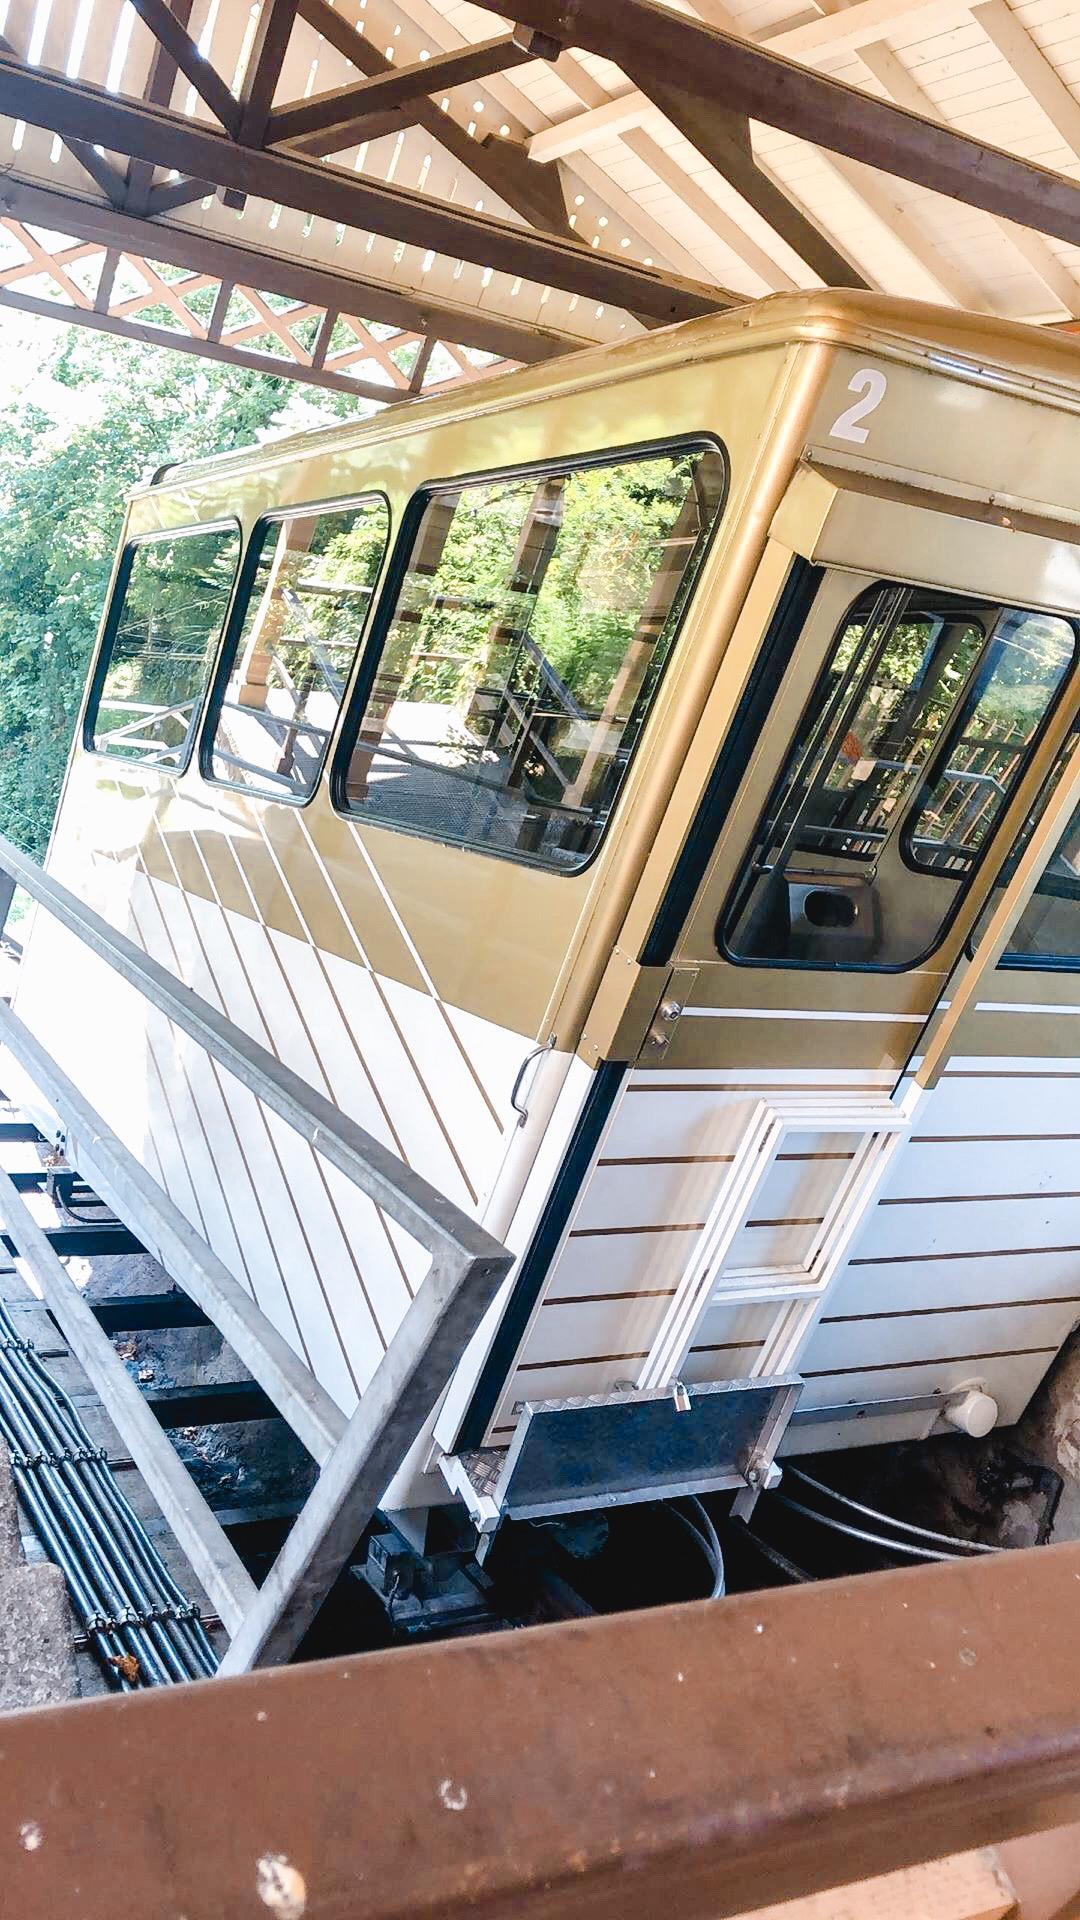 territet-montreux-funi-train